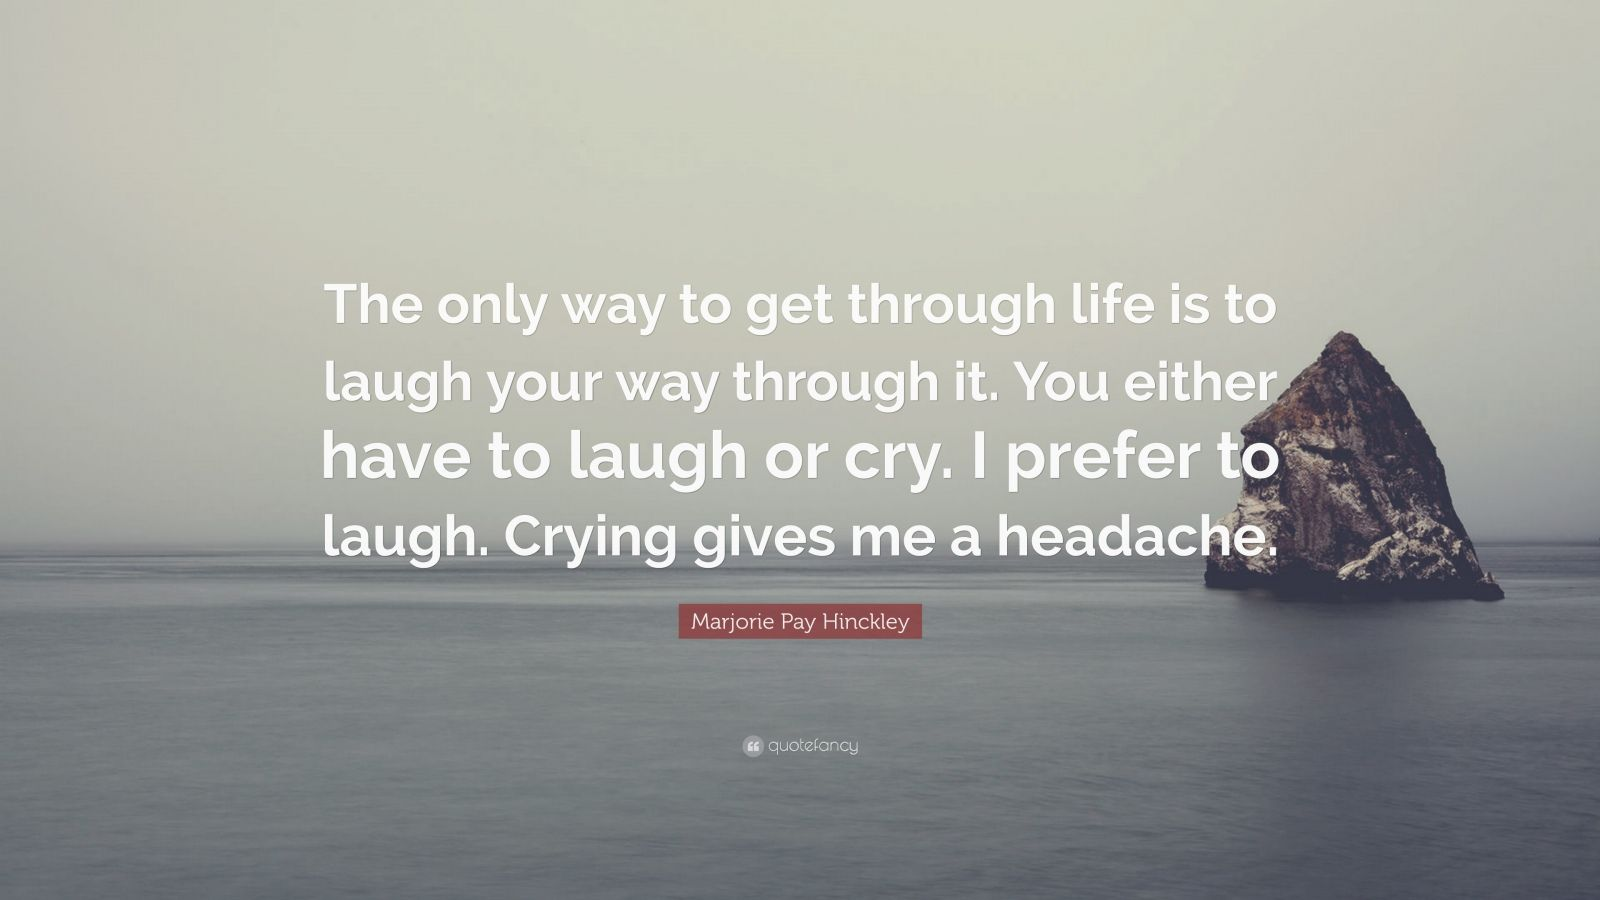 Laughing Hard Gives Me Headache